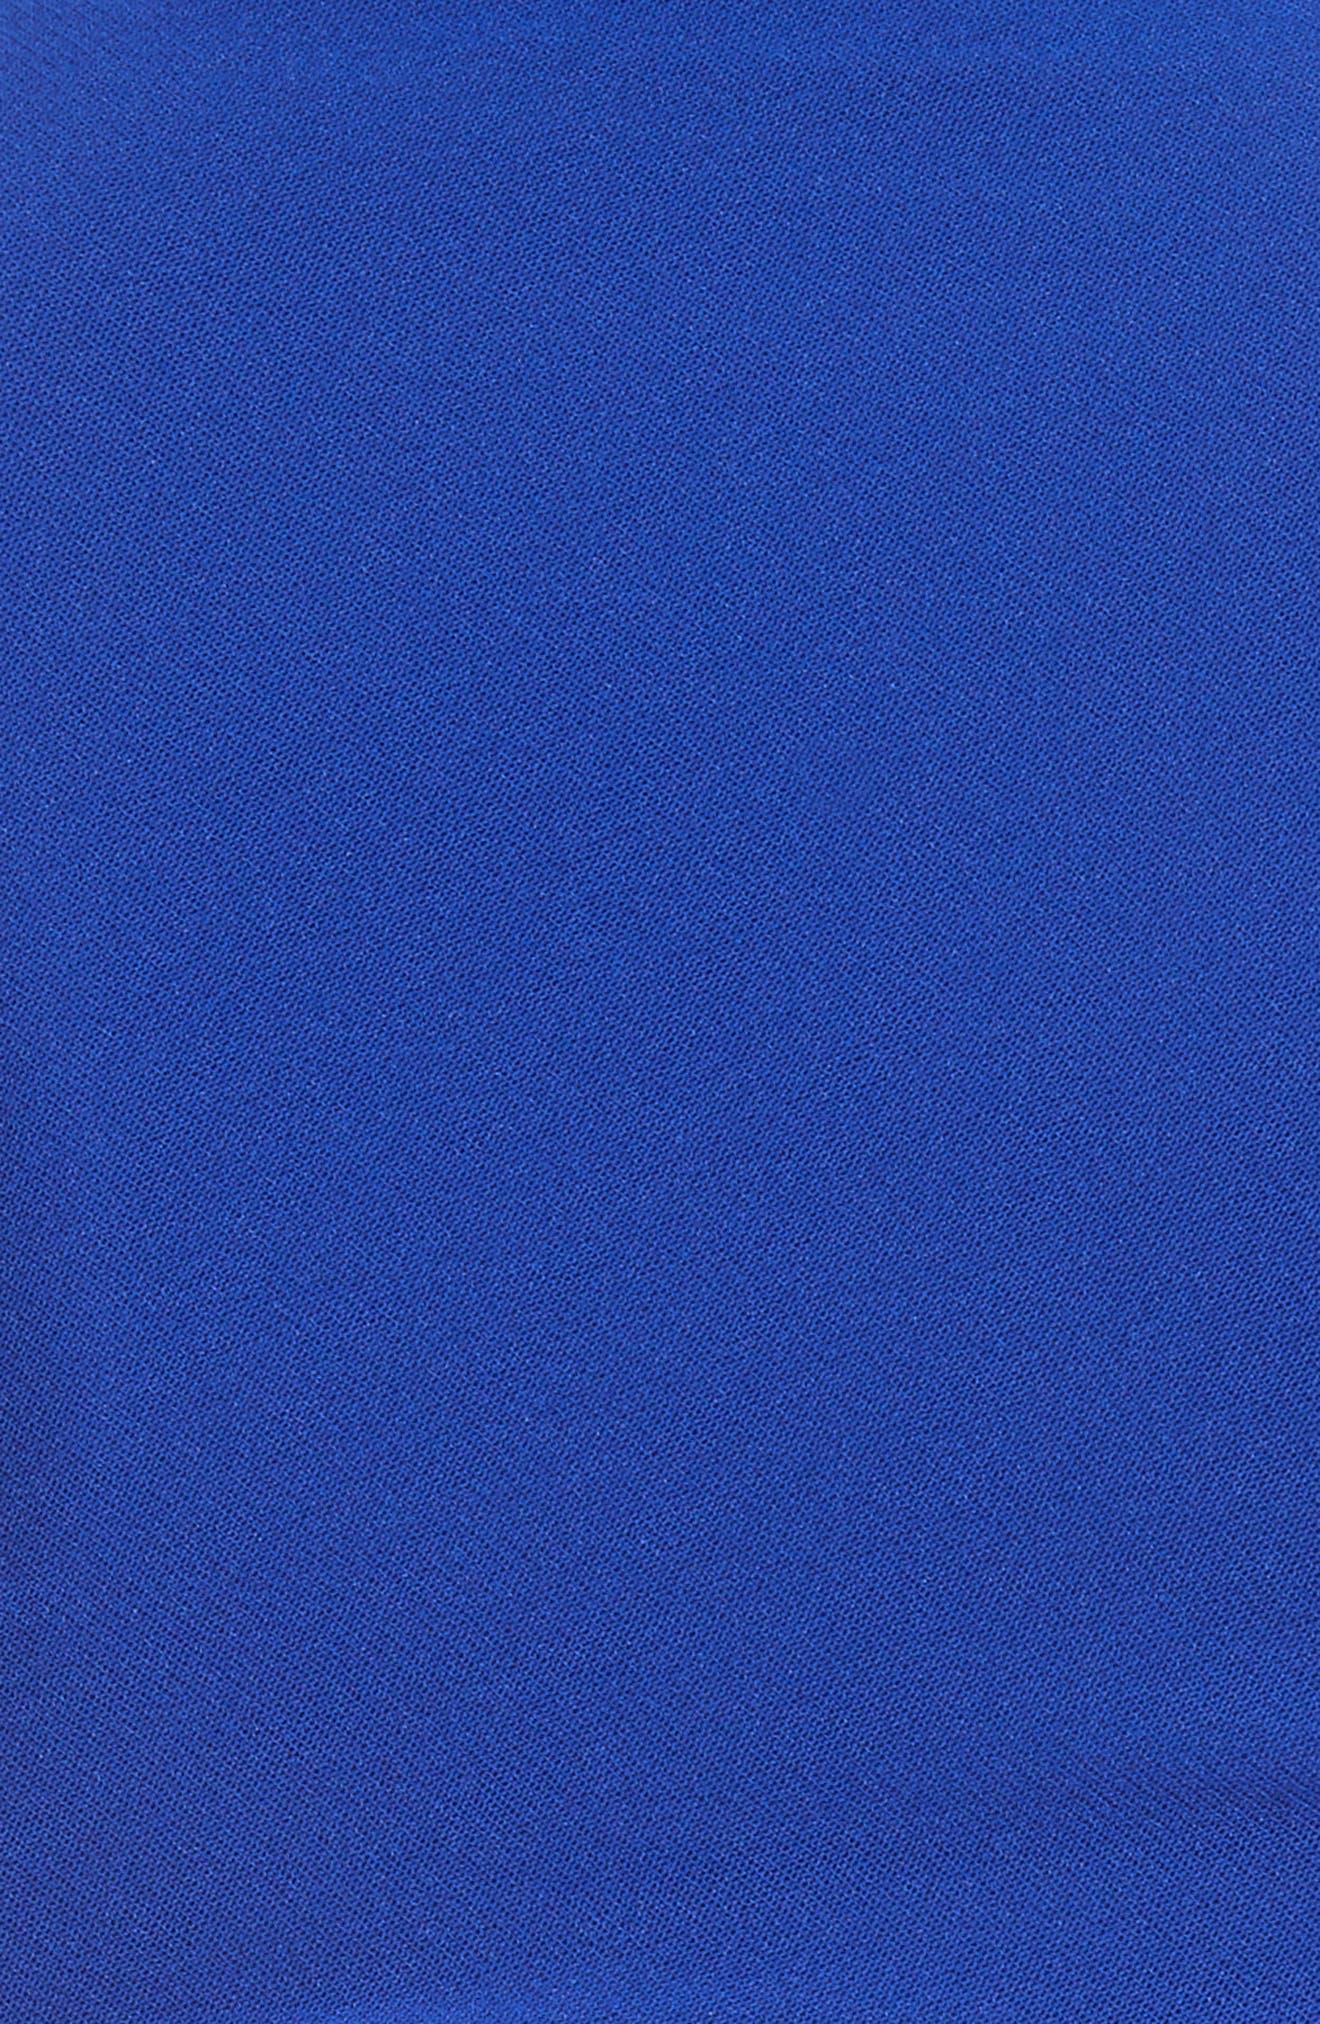 Tulle Turtleneck Midi Dress,                             Alternate thumbnail 5, color,                             434